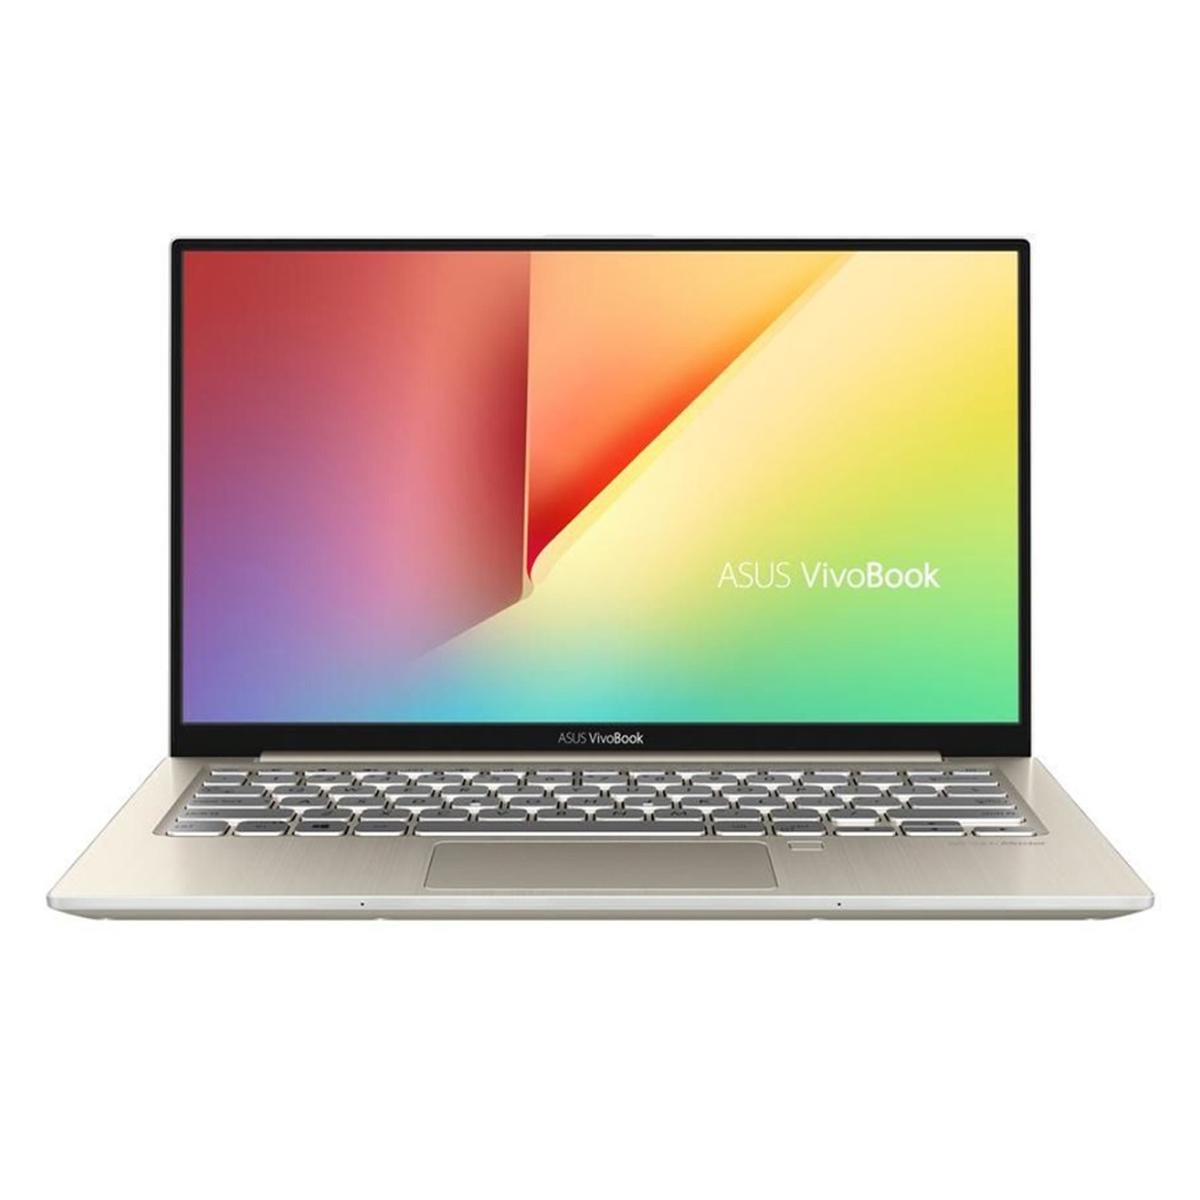 لپ تاپ 13 اینچی ایسوس مدل VivoBook S330FL - A